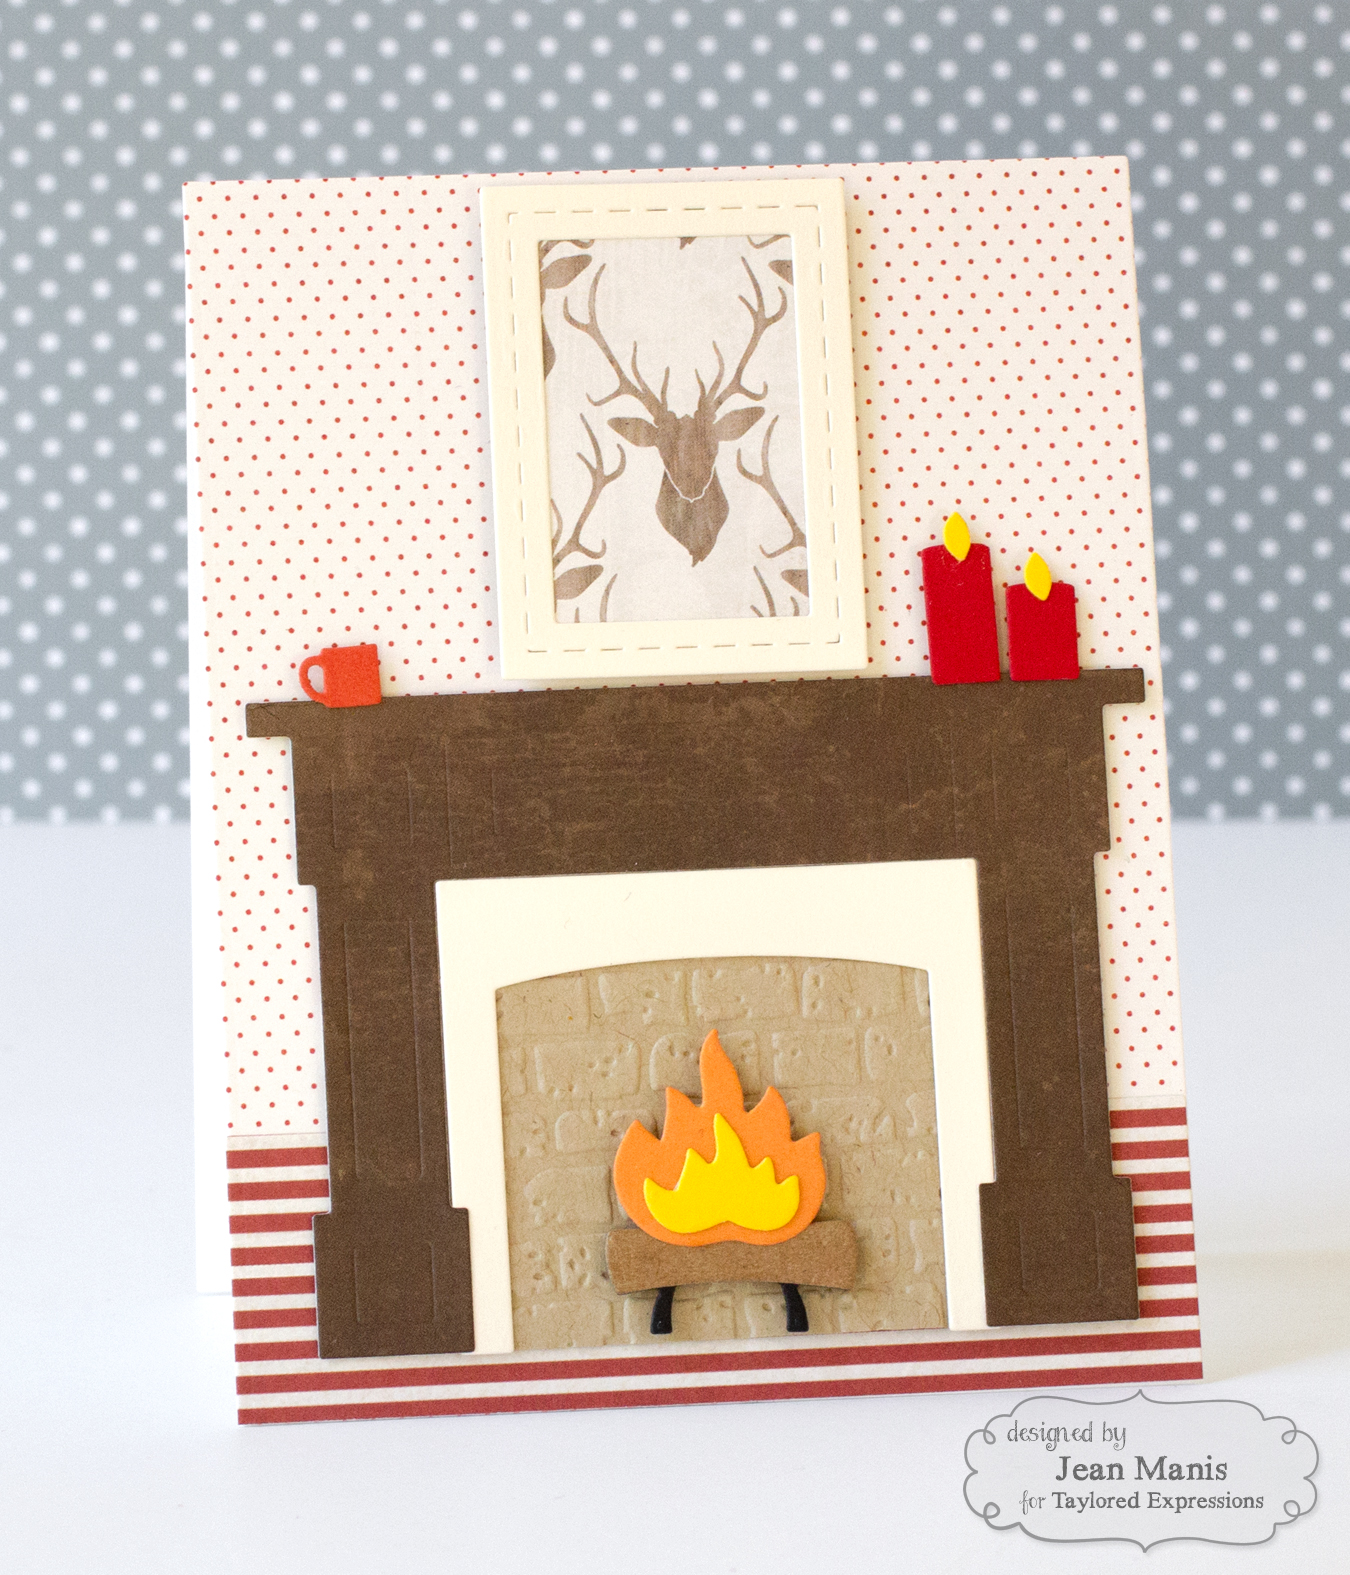 TE By the Fireside